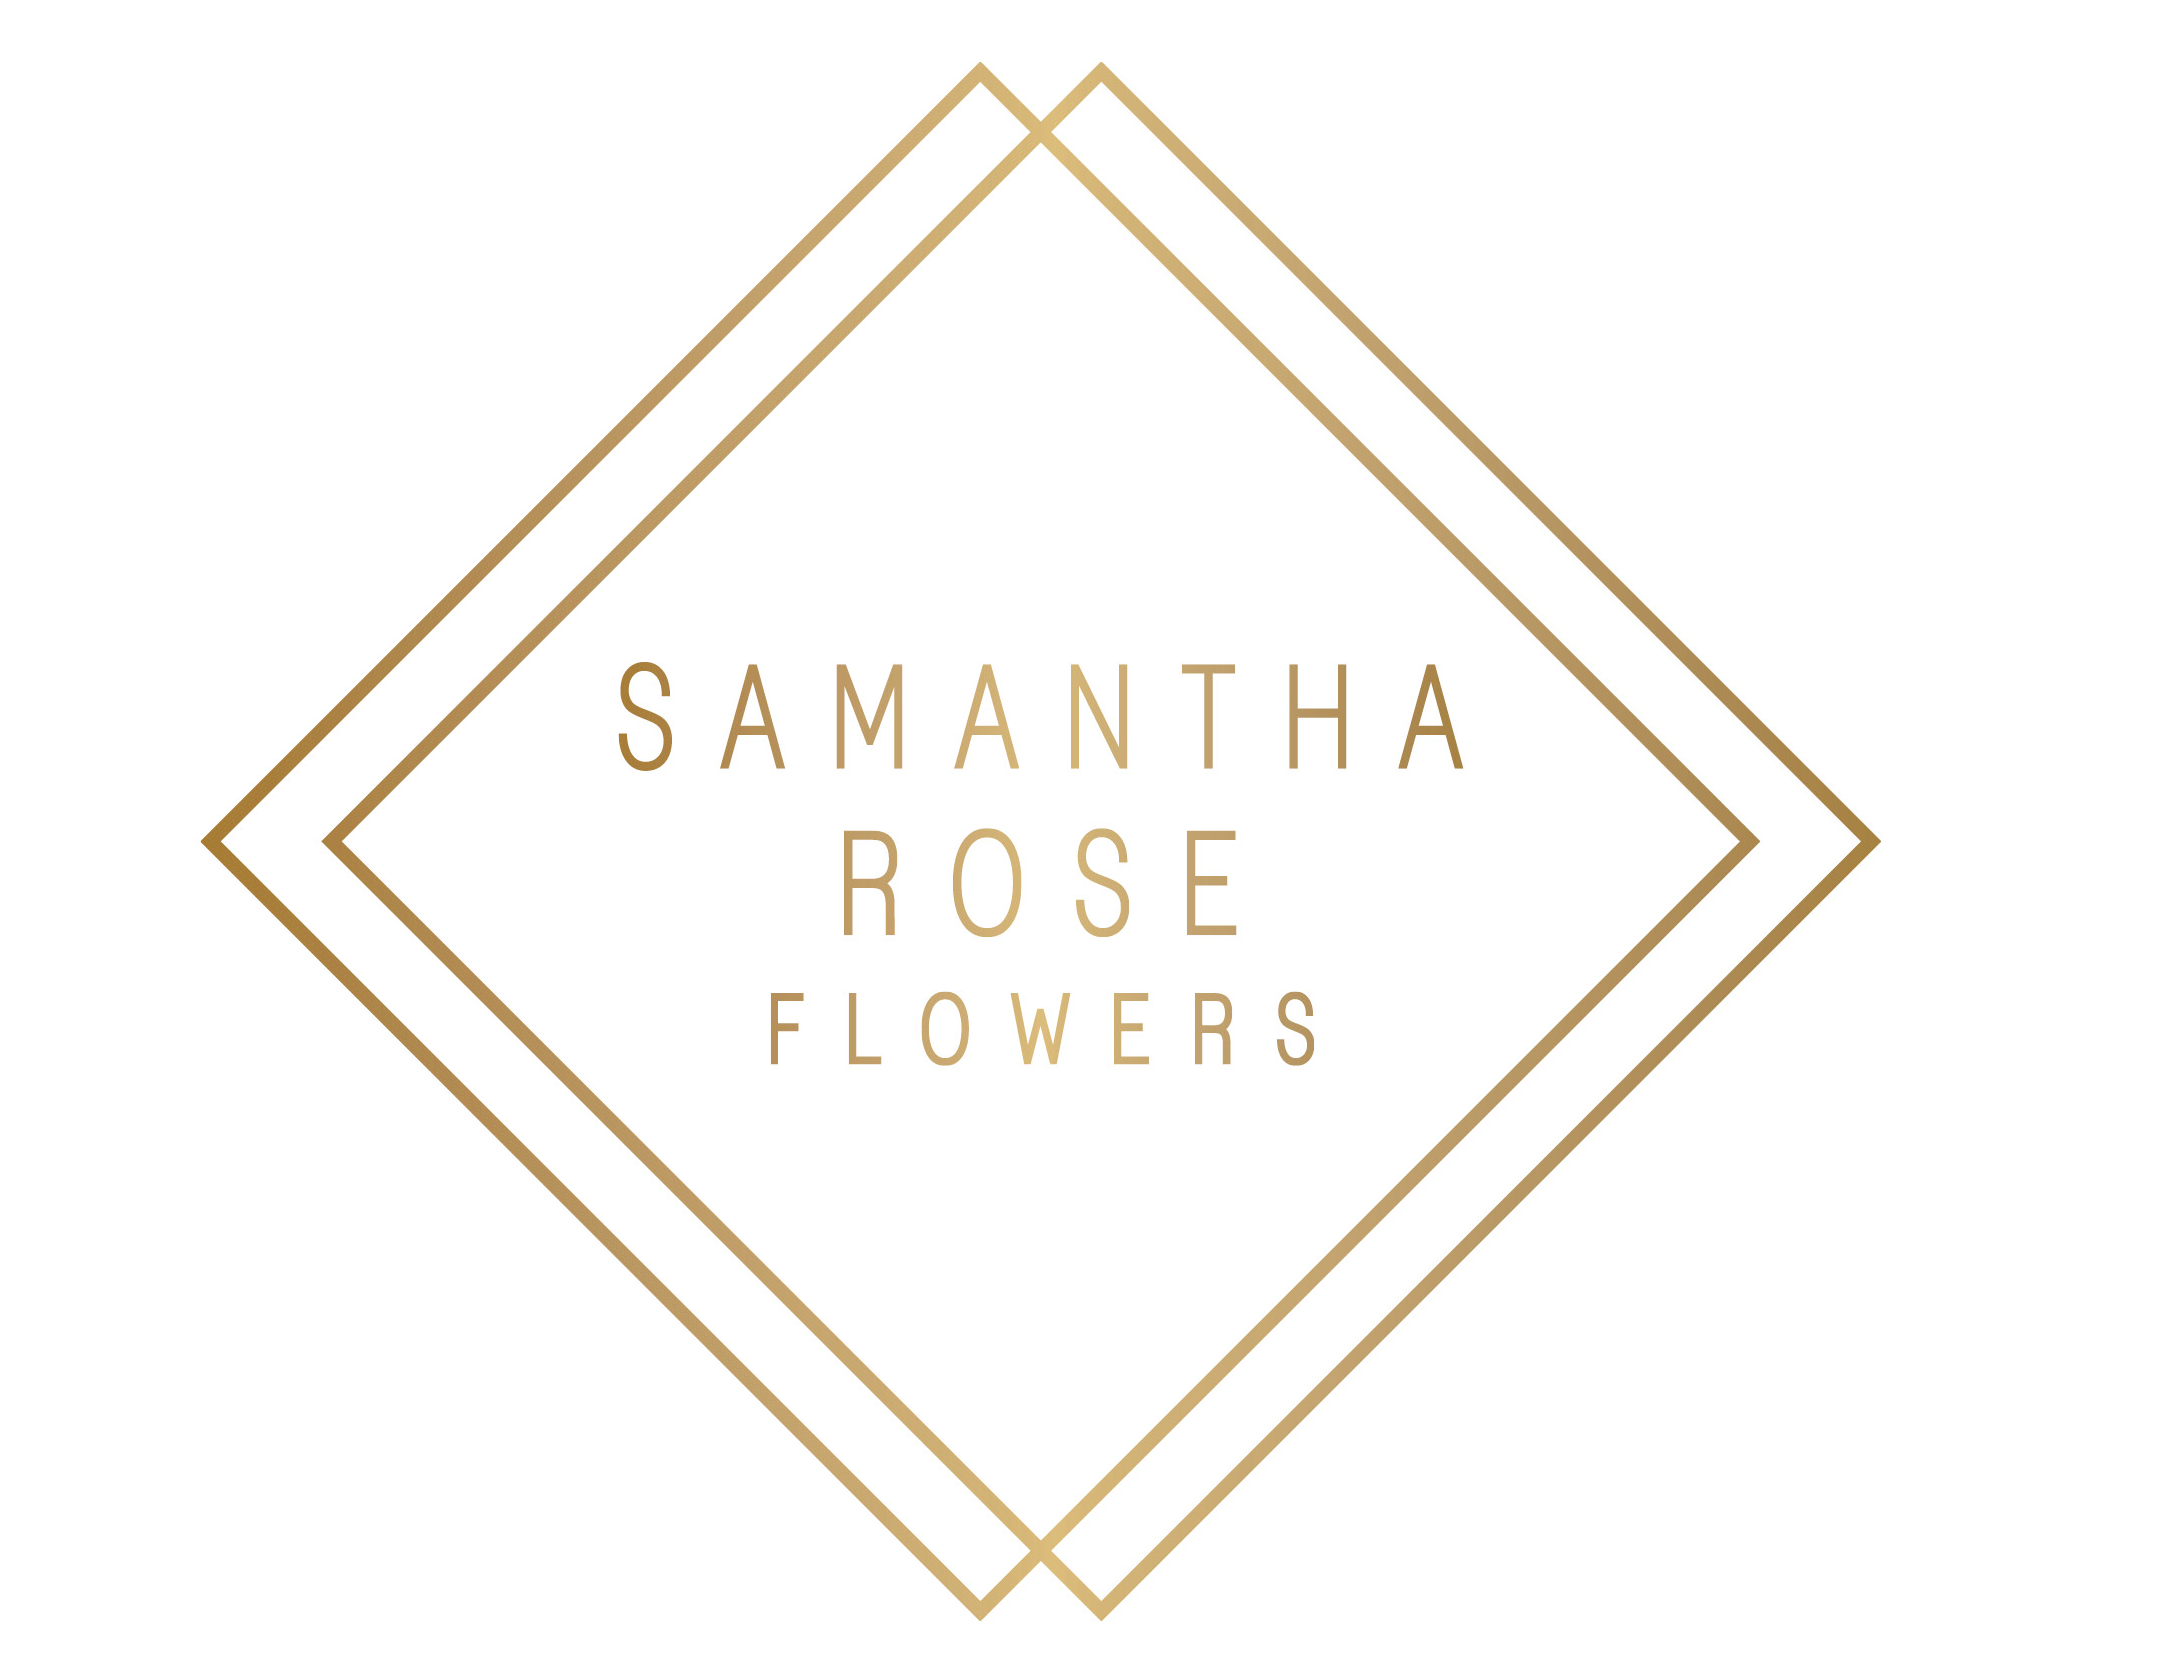 Samantha Rose Flowers